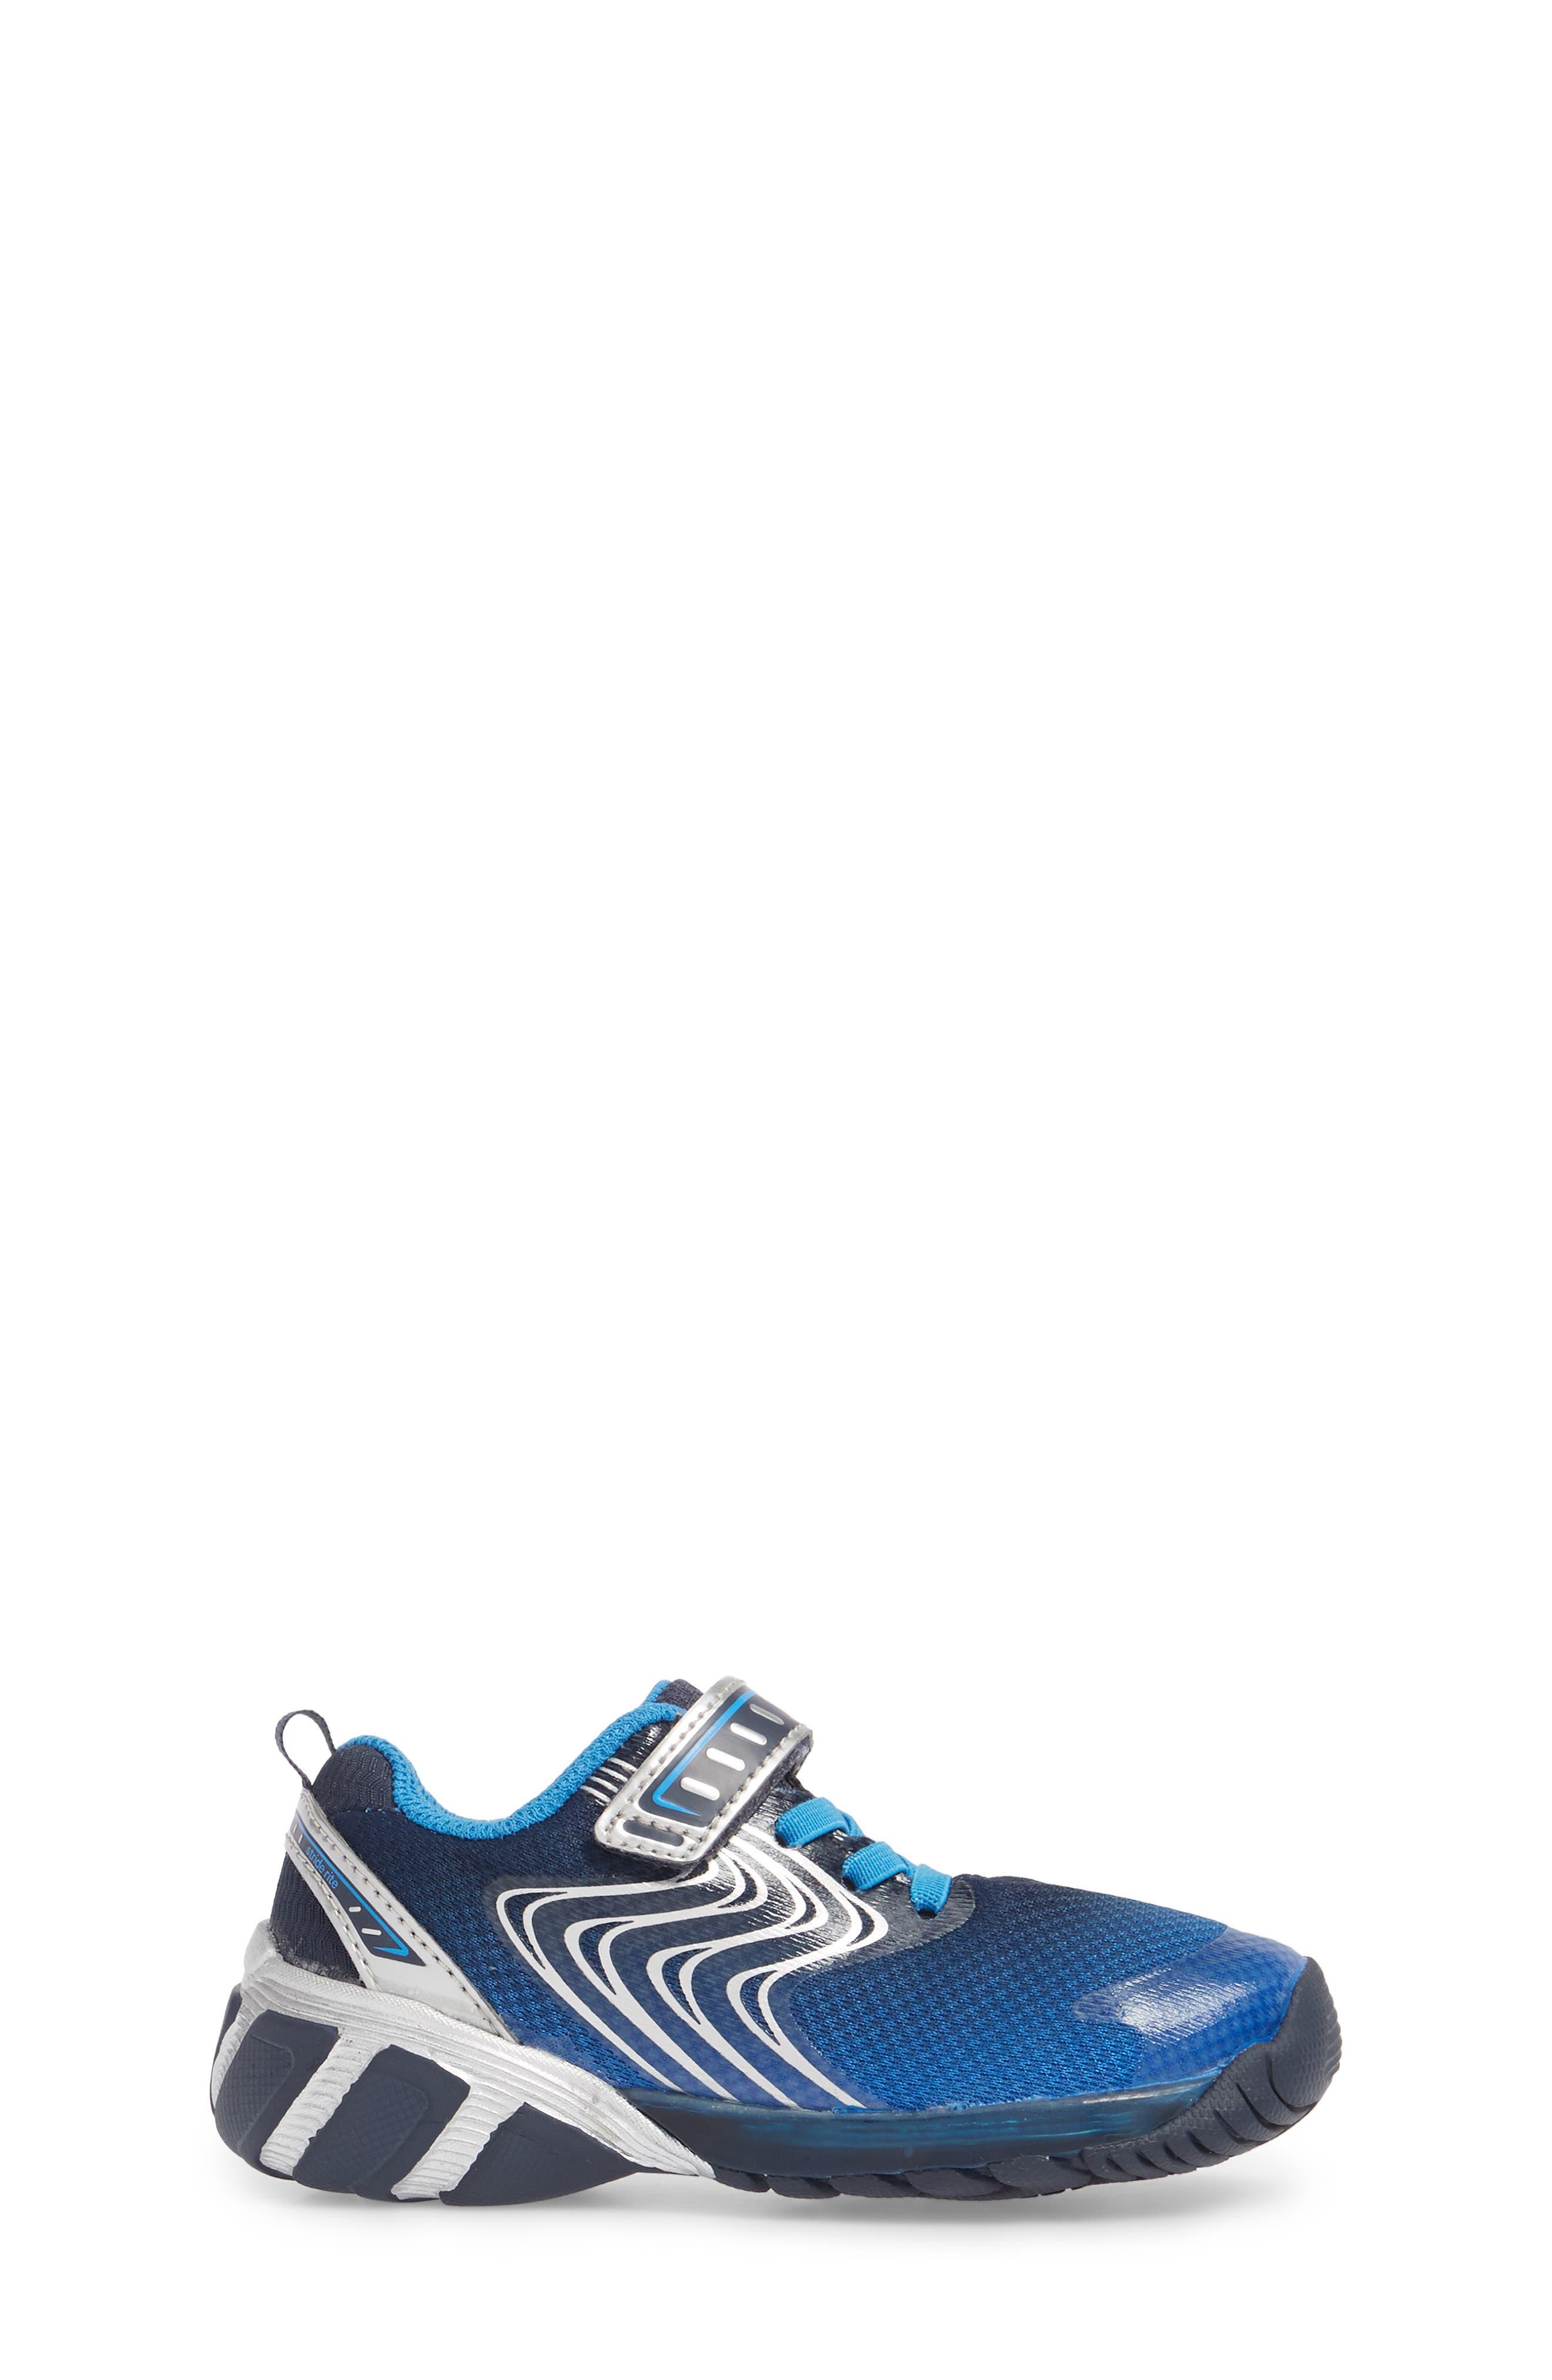 Alternate Image 3  - Stride Rite Lights Lux Light-Up Sneaker (Walker &Toddler)